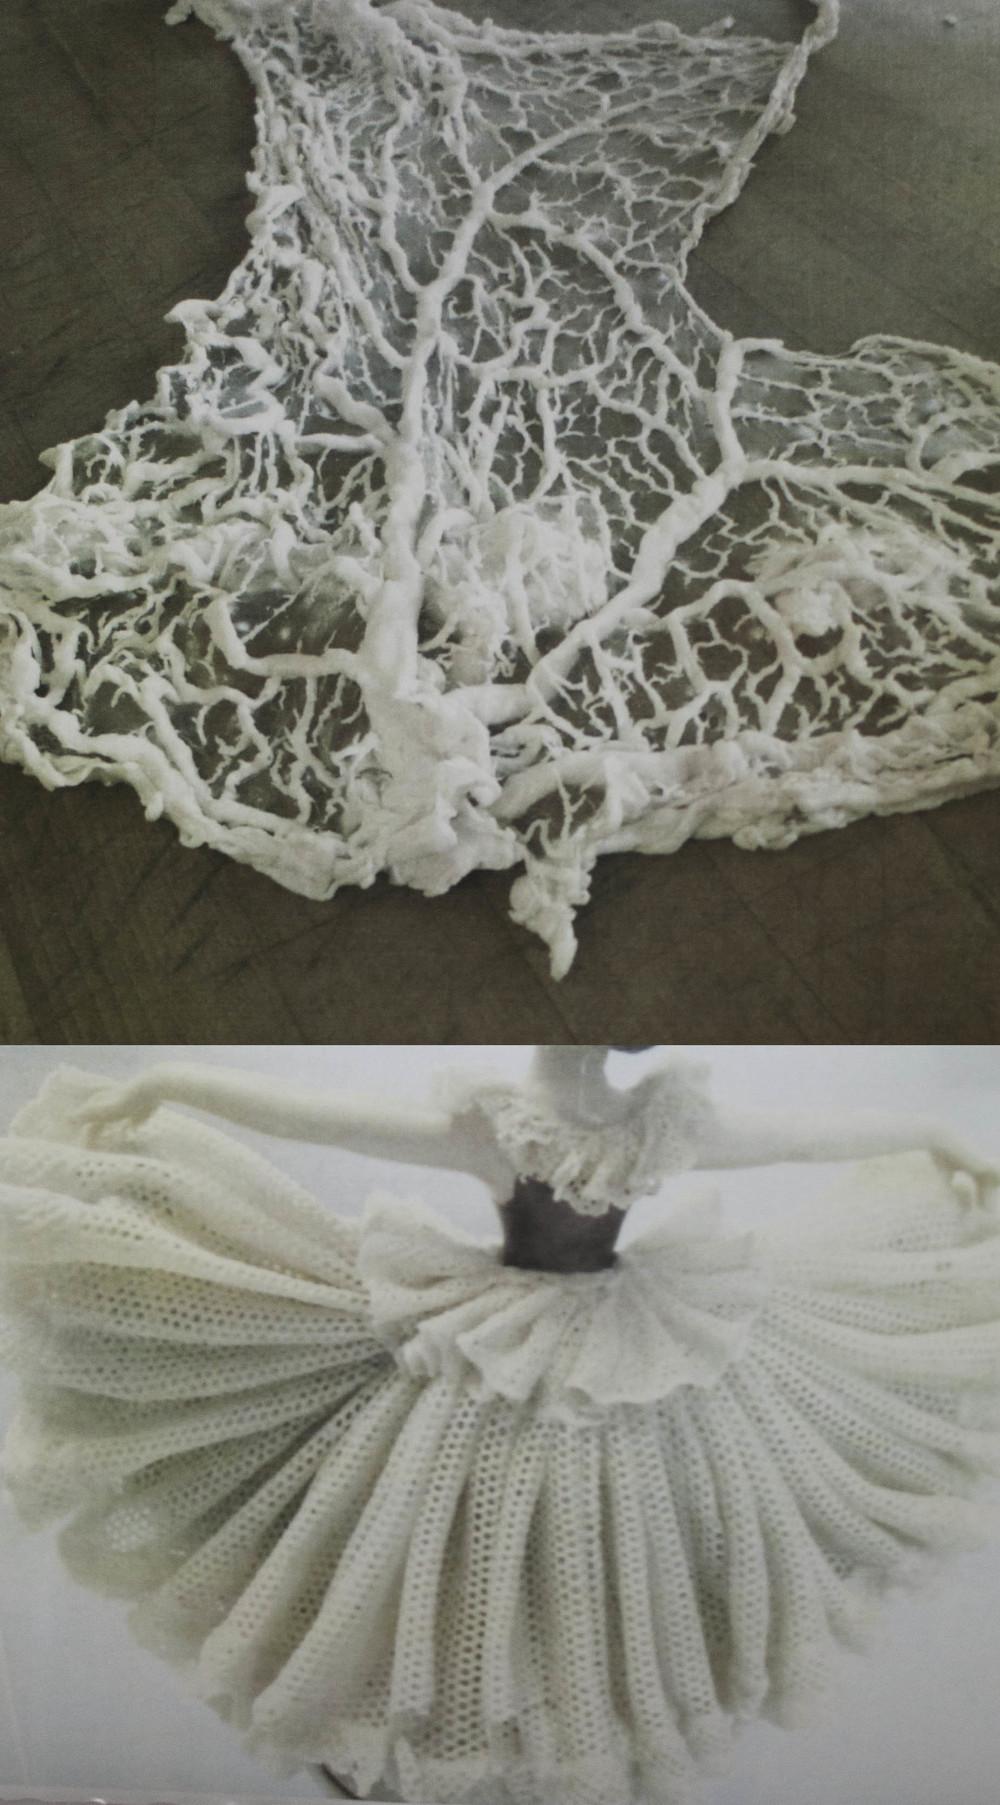 Investigando la técnica de porcelana Dresden, queriendo hacer de tripas porcelana.